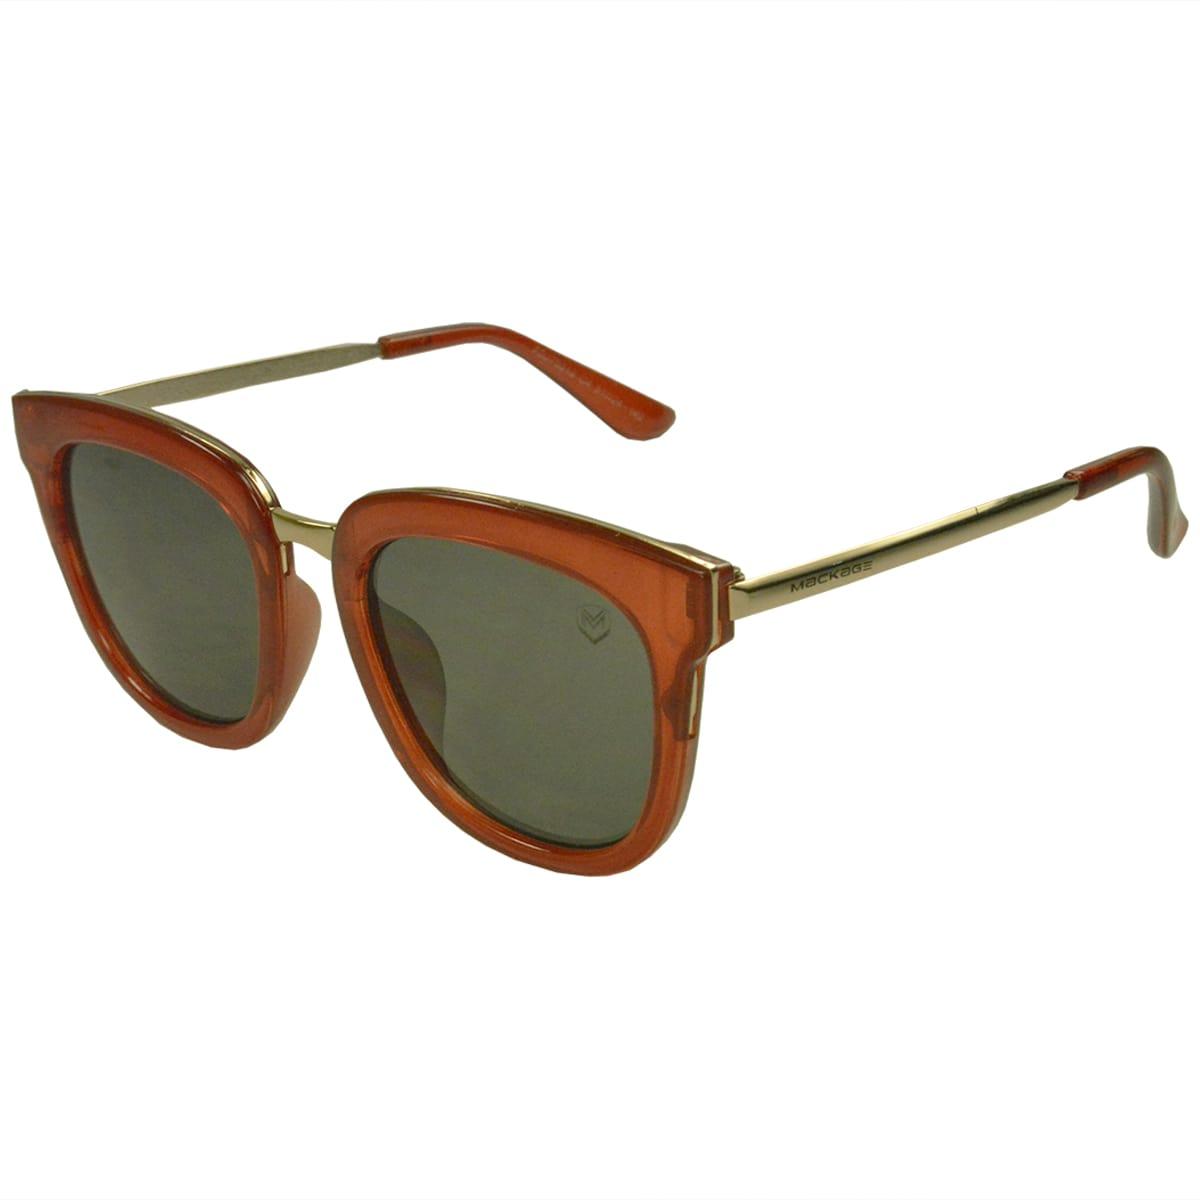 Óculos de Sol MK75019C4LN Vermelho Brilhoso